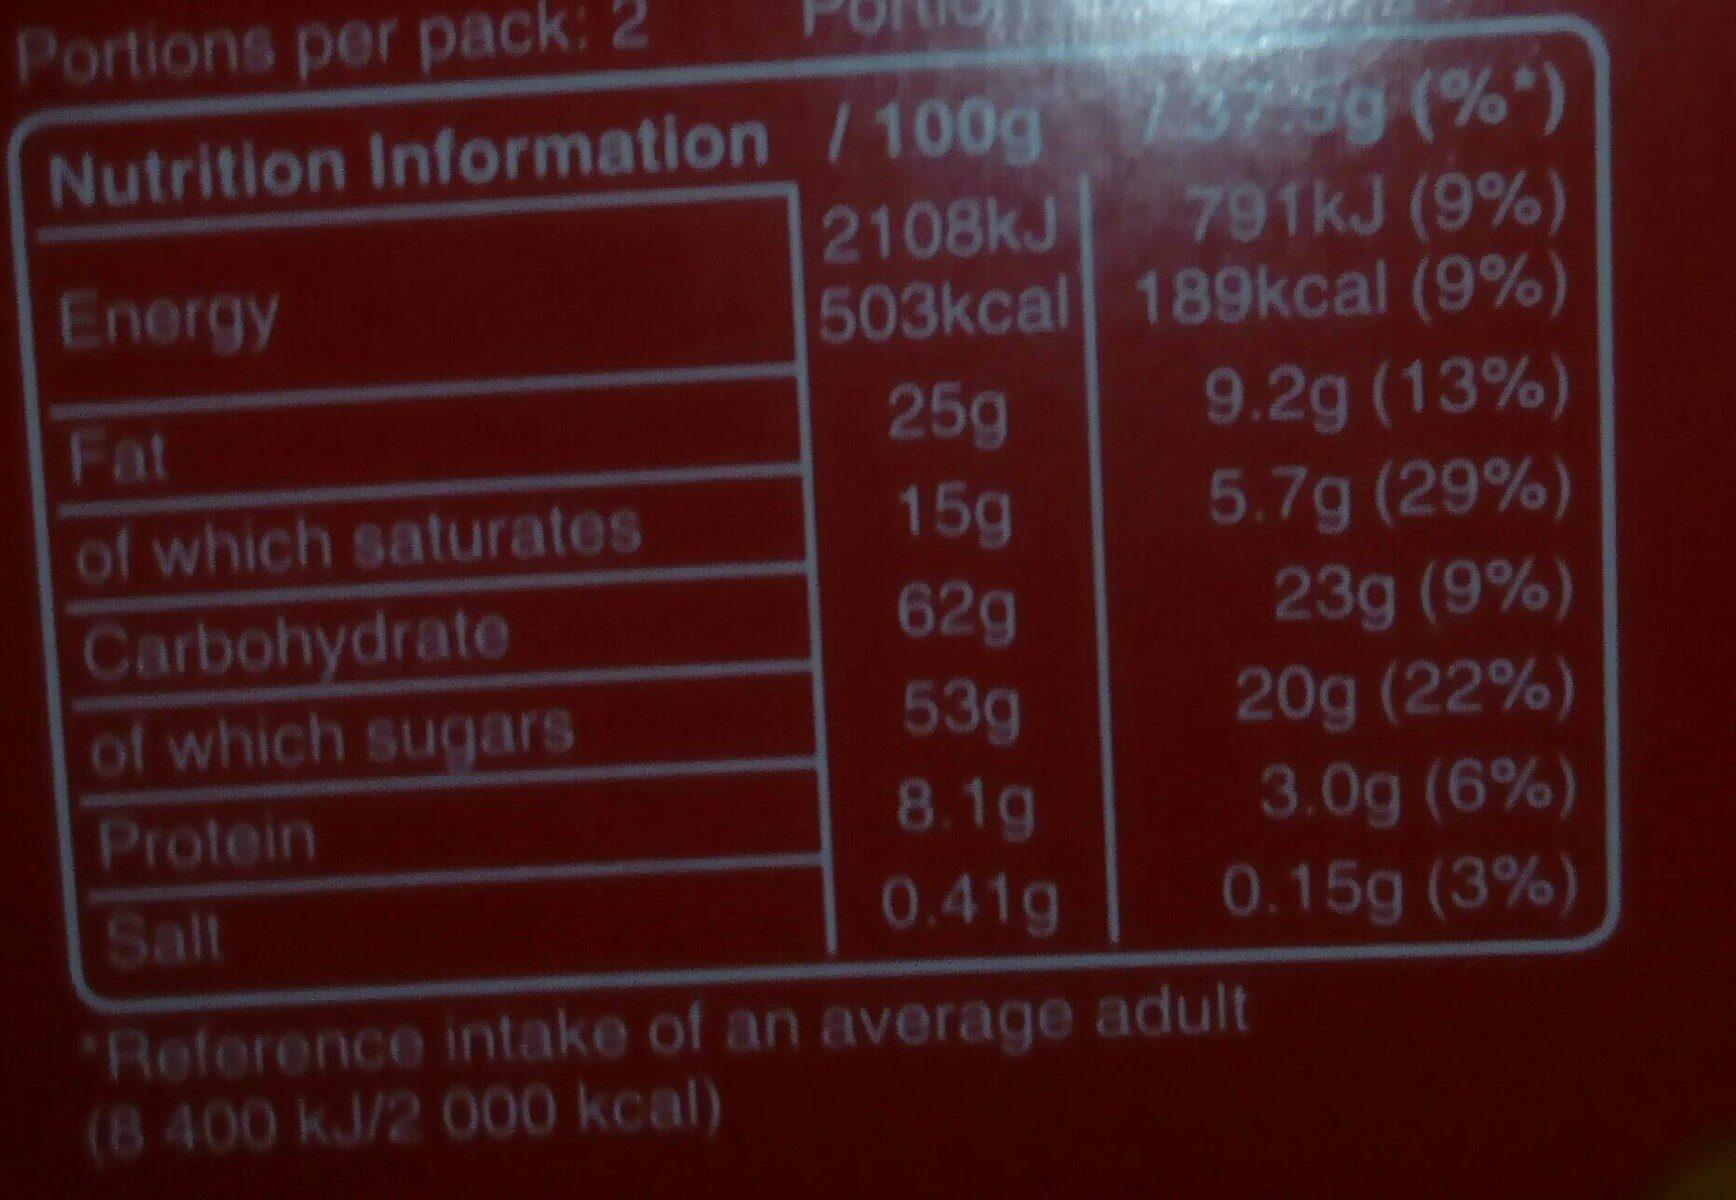 Leek & Potato Soup - Nutrition facts - en